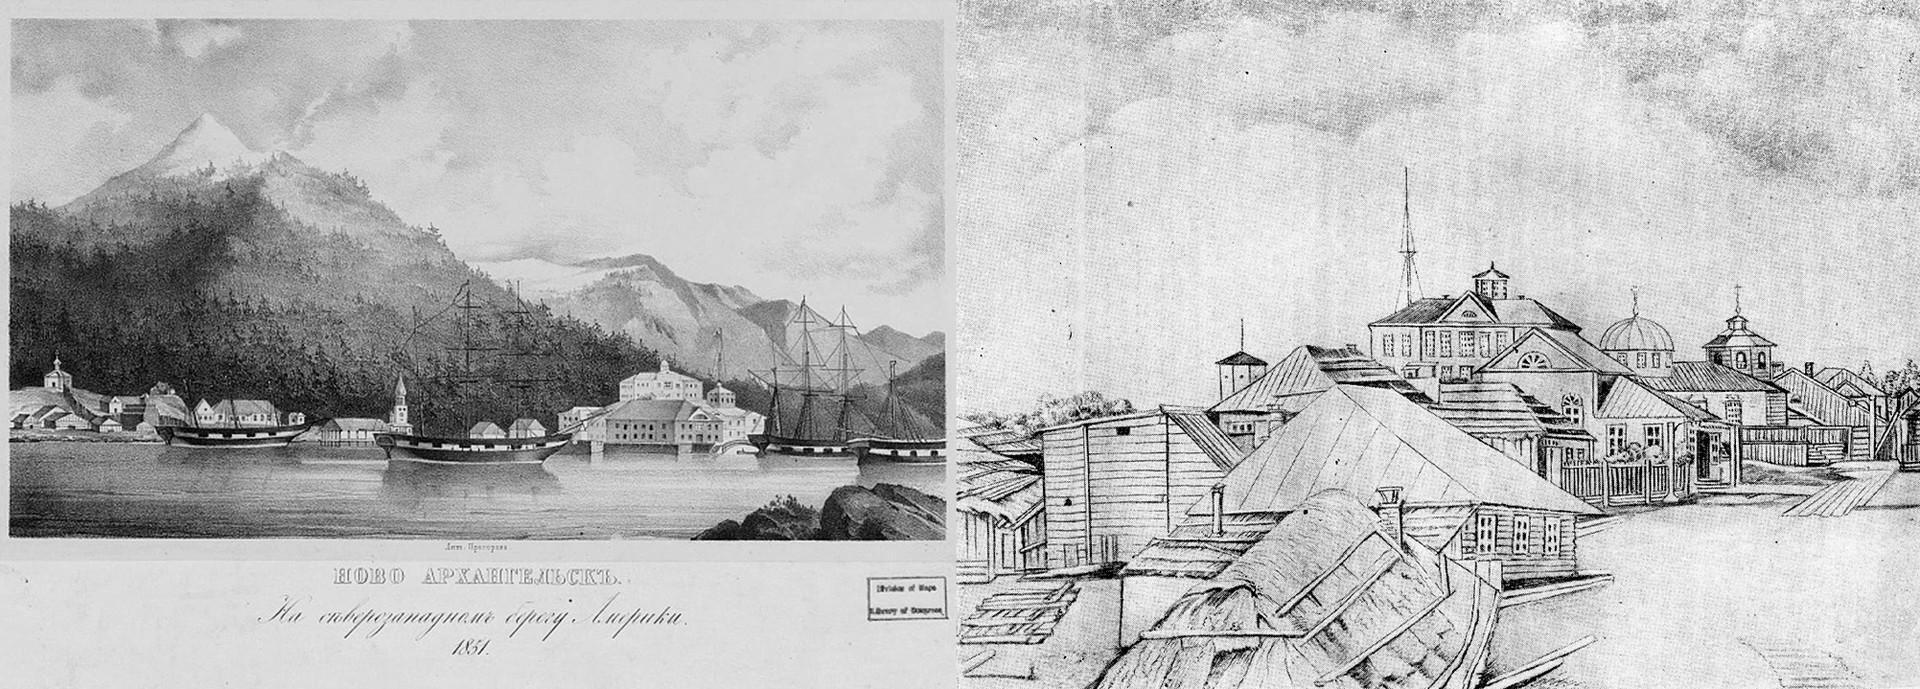 Novoarkhanguelsk, 1851